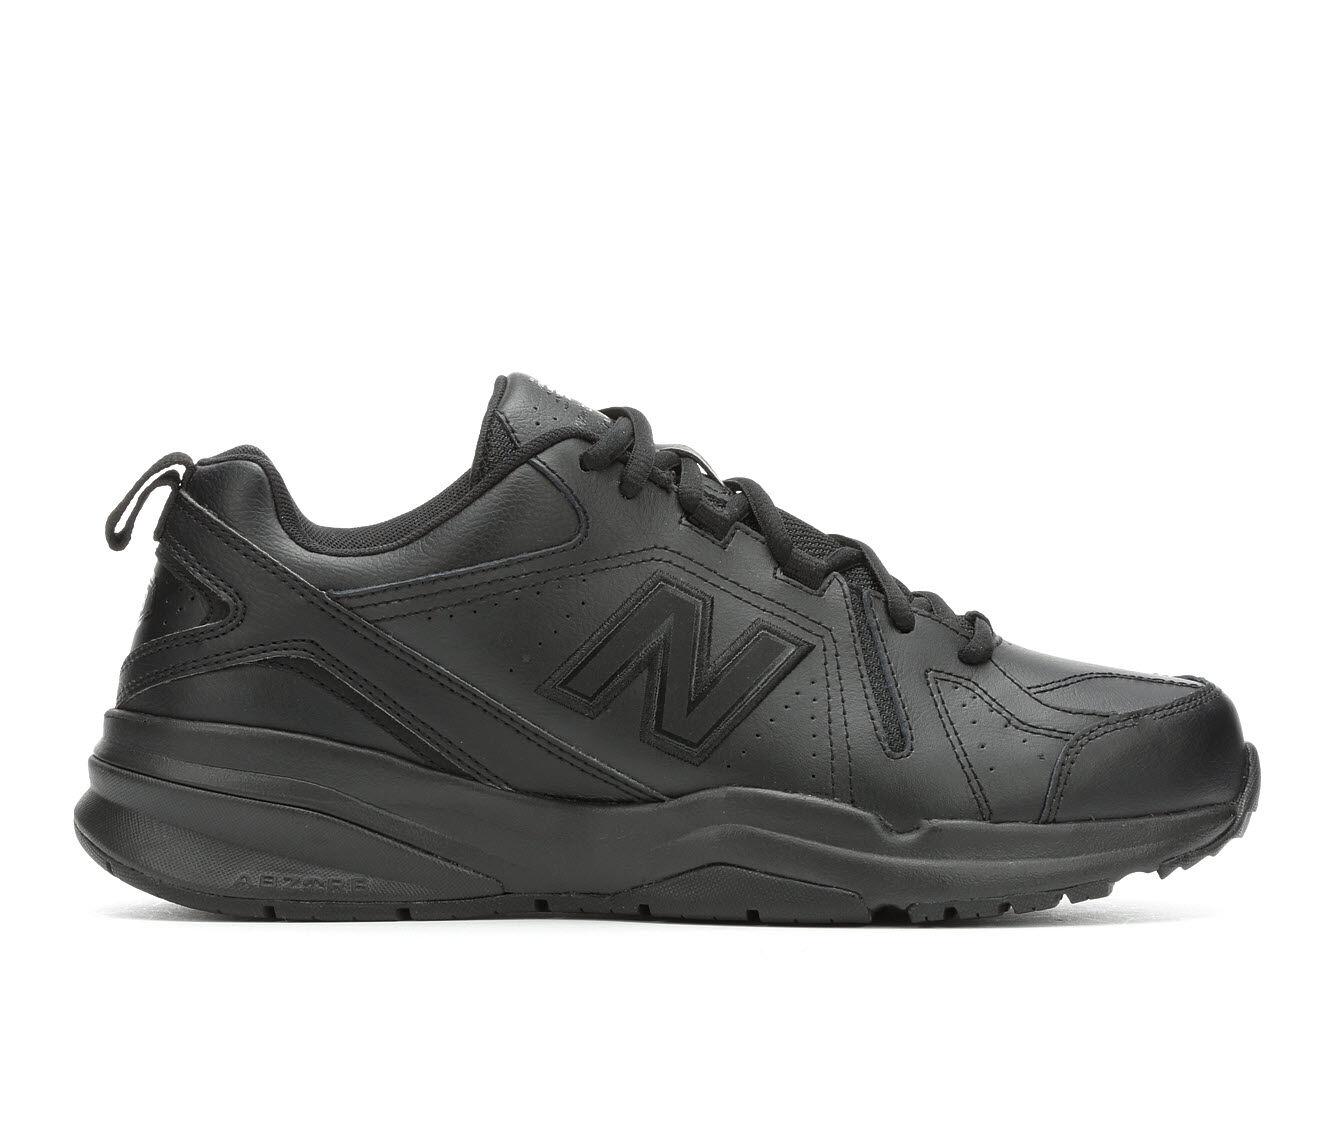 Men's New Balance MX608V5 Training Shoes Blk Slip Resist